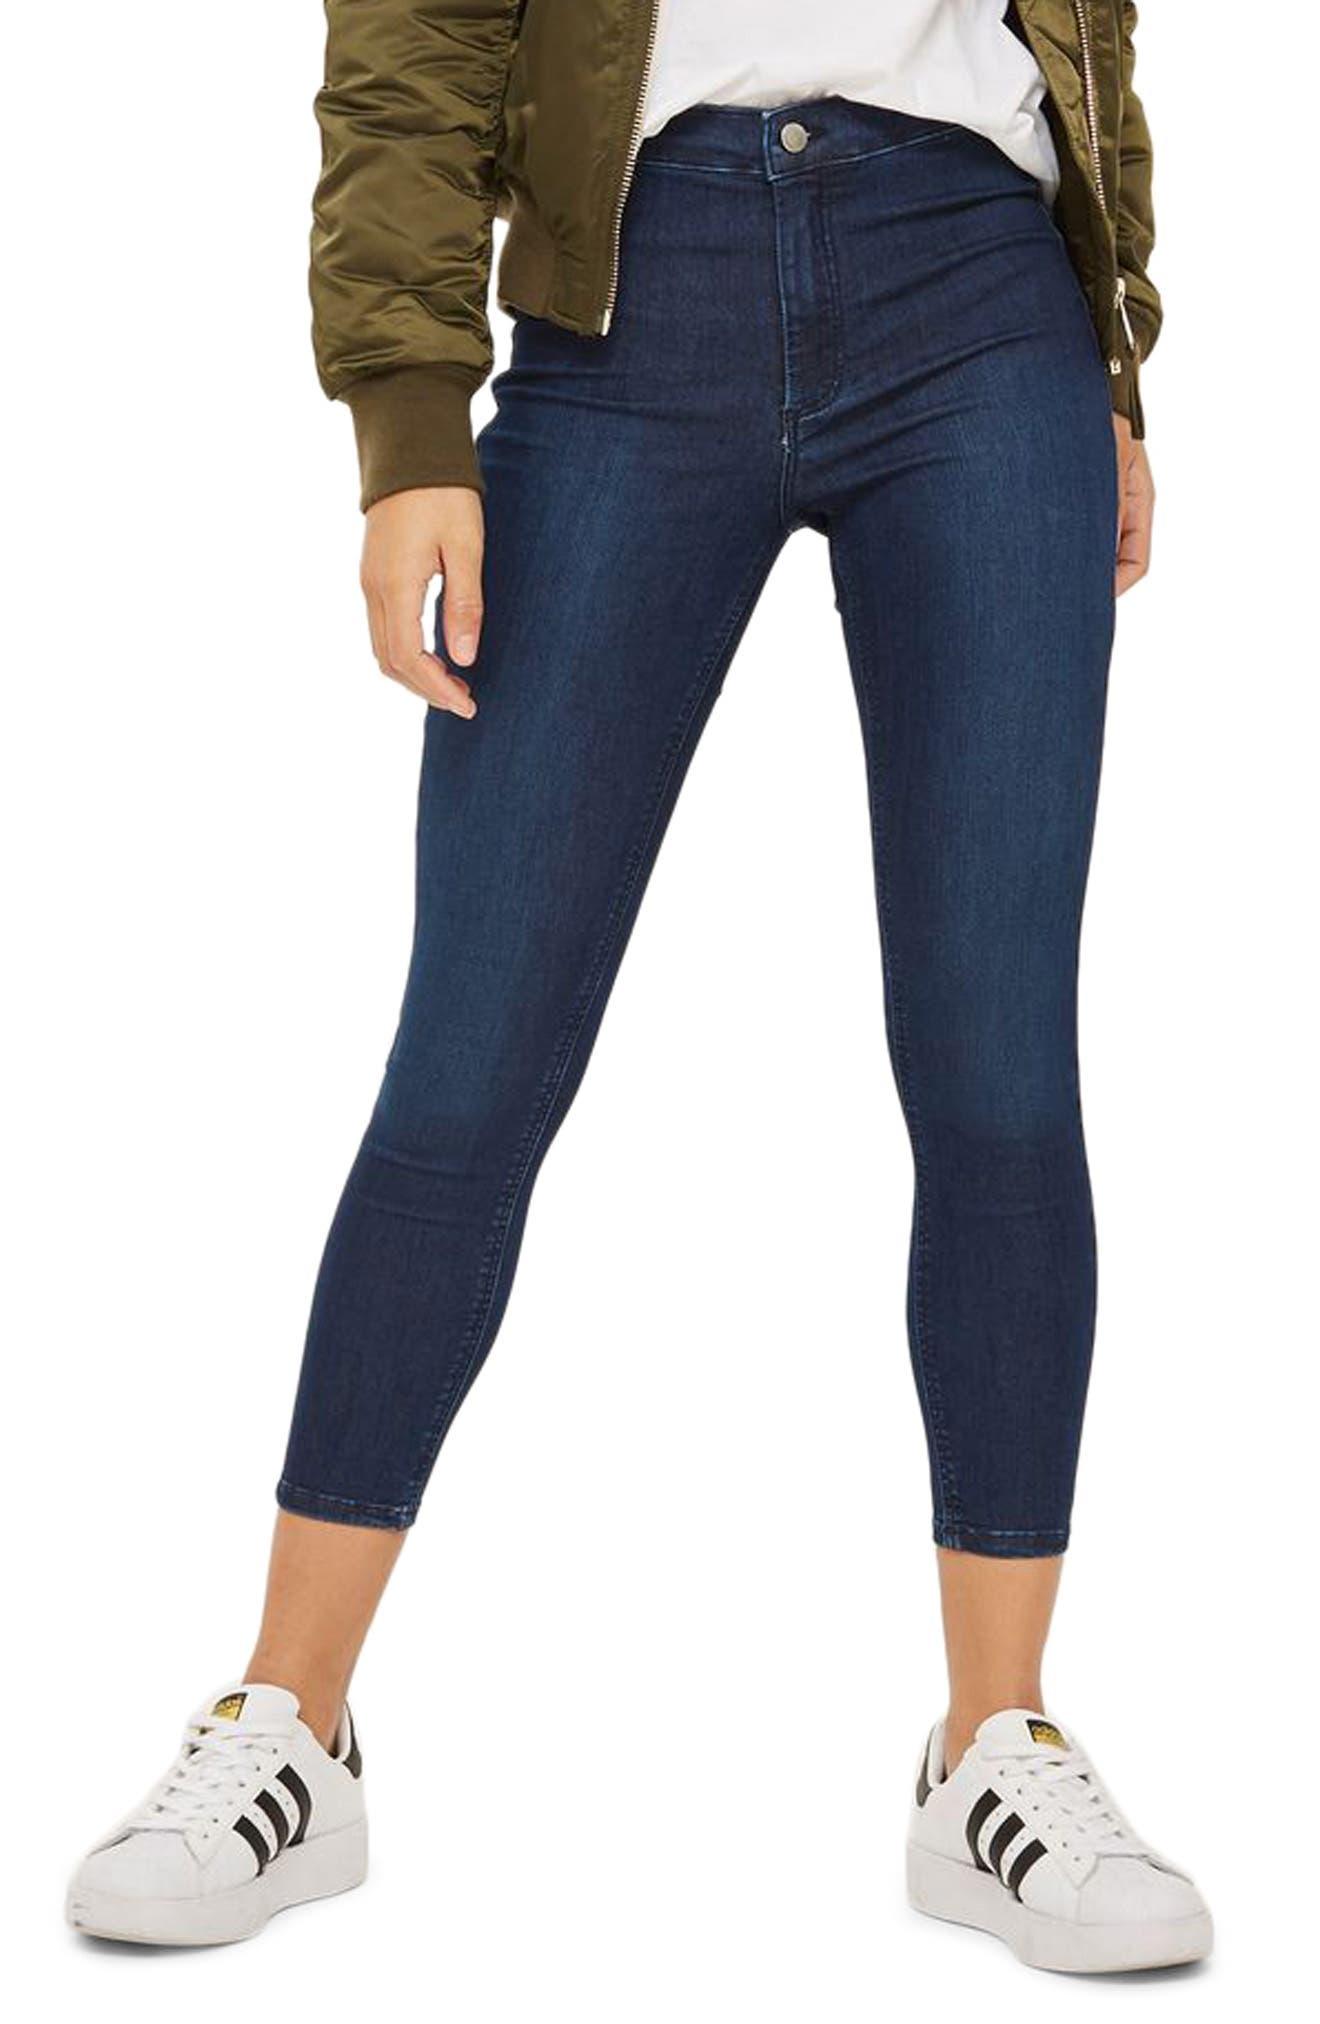 Joni High Waist Skinny Jeans,                         Main,                         color, 401